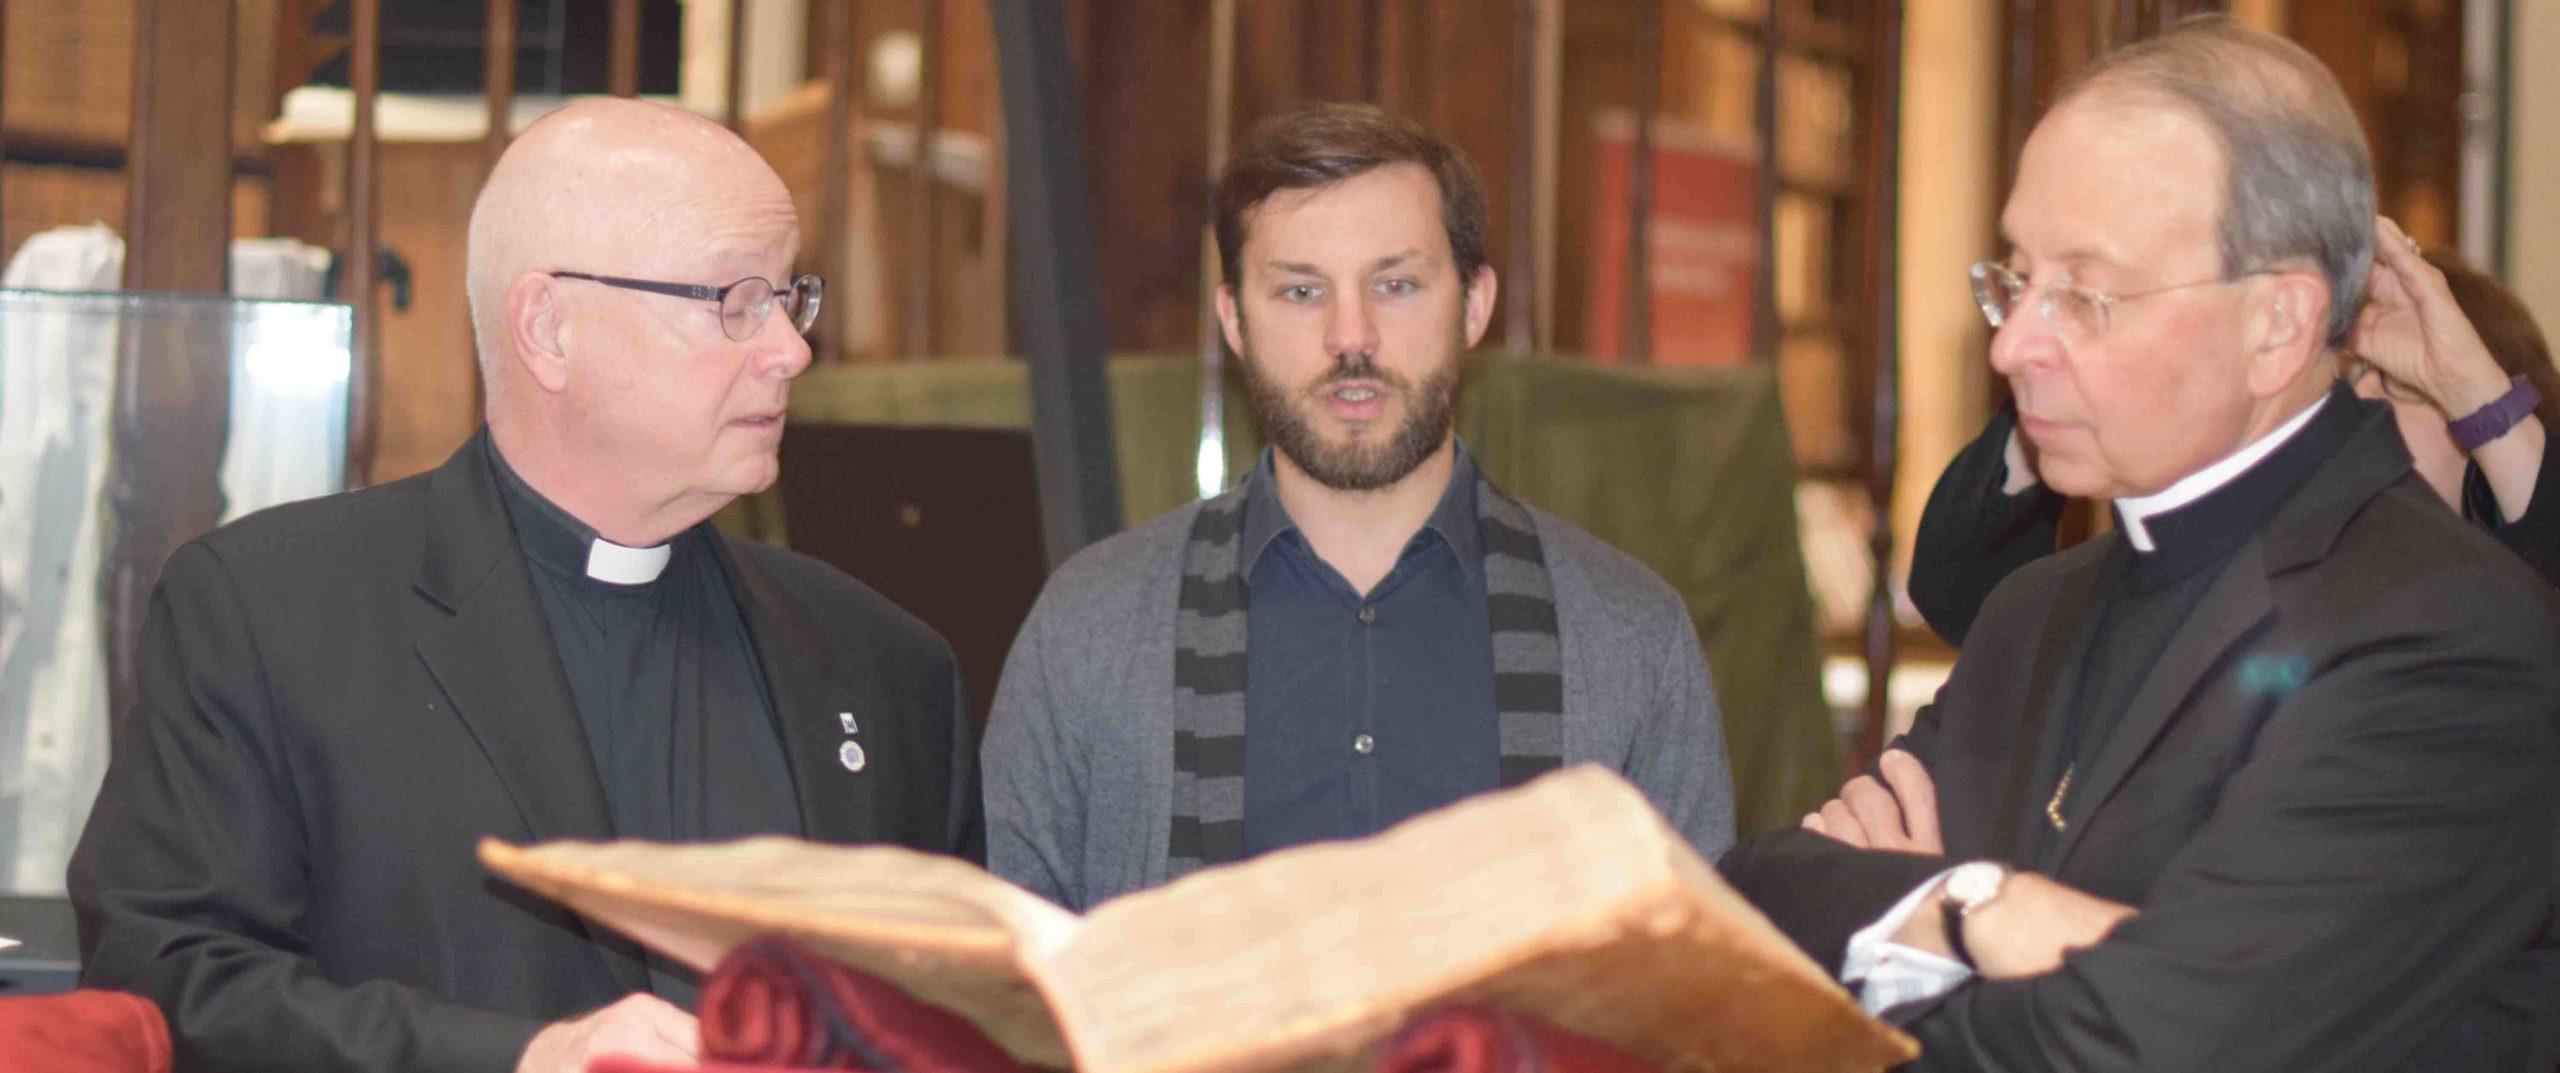 French symposium focuses on religious freedom